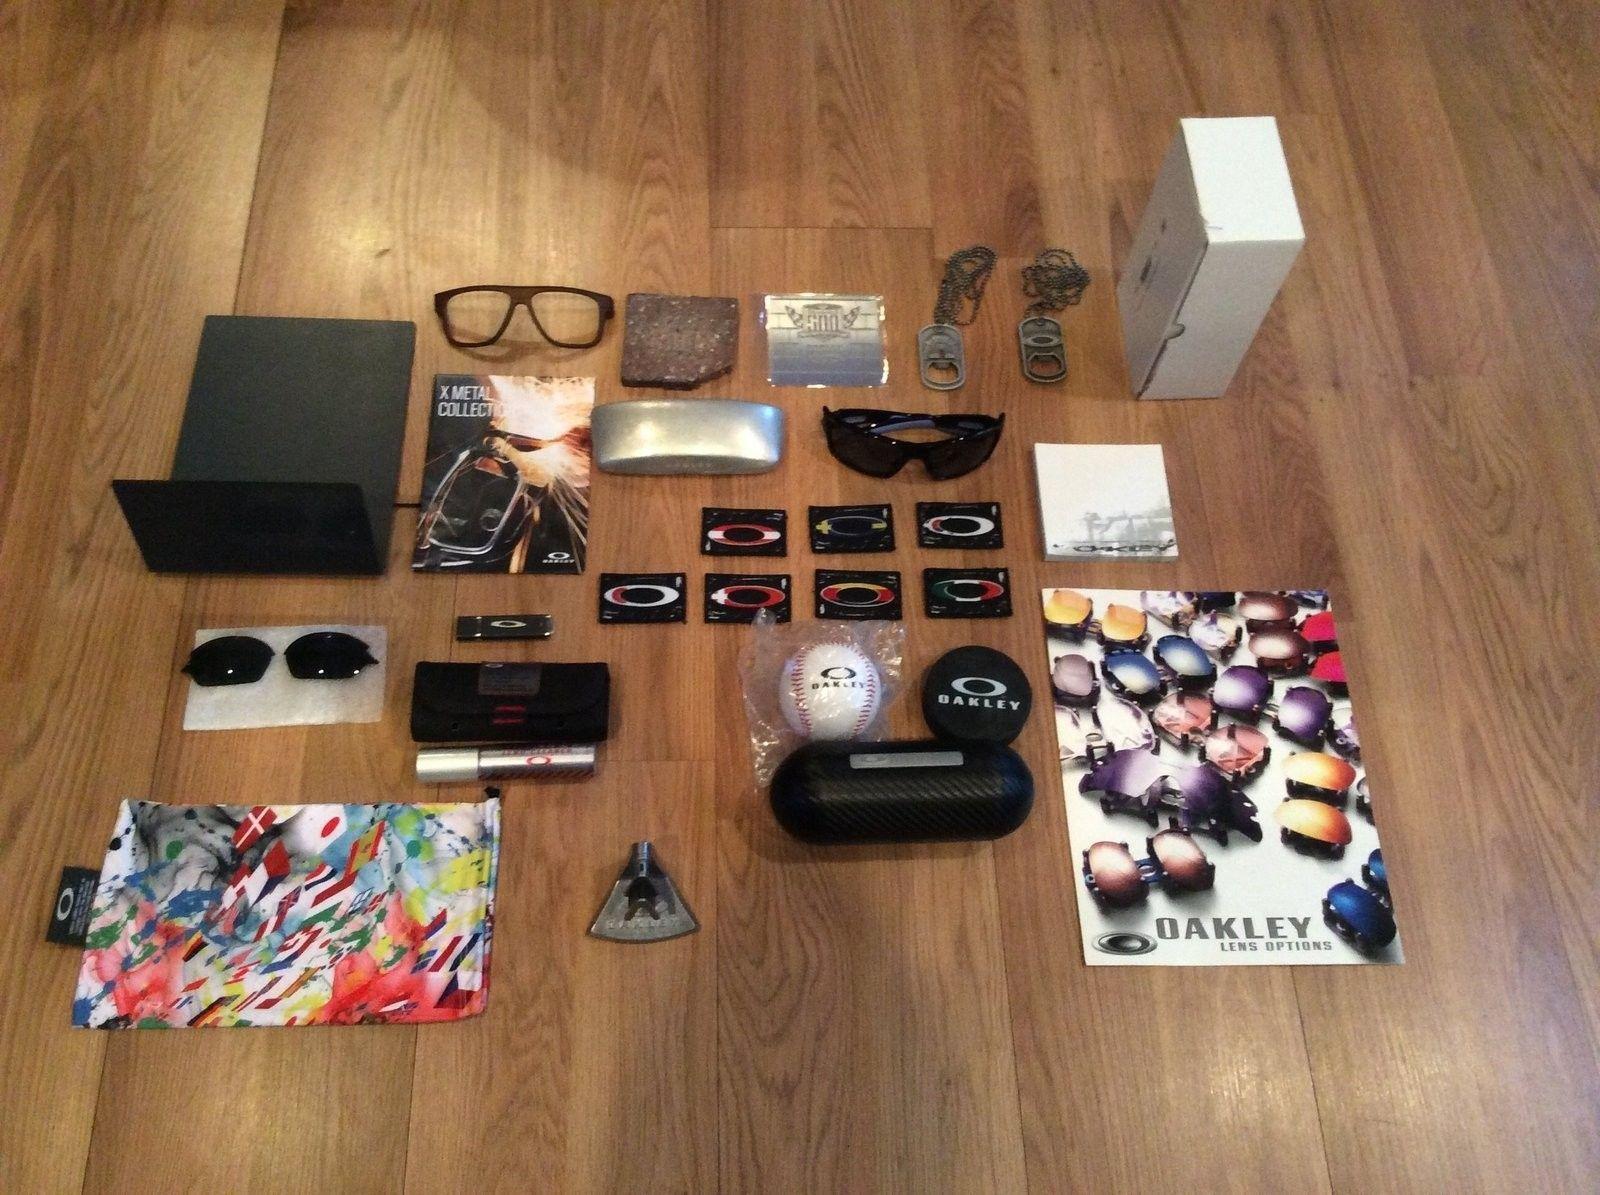 Random Display Items $250 Shipped - image.jpg